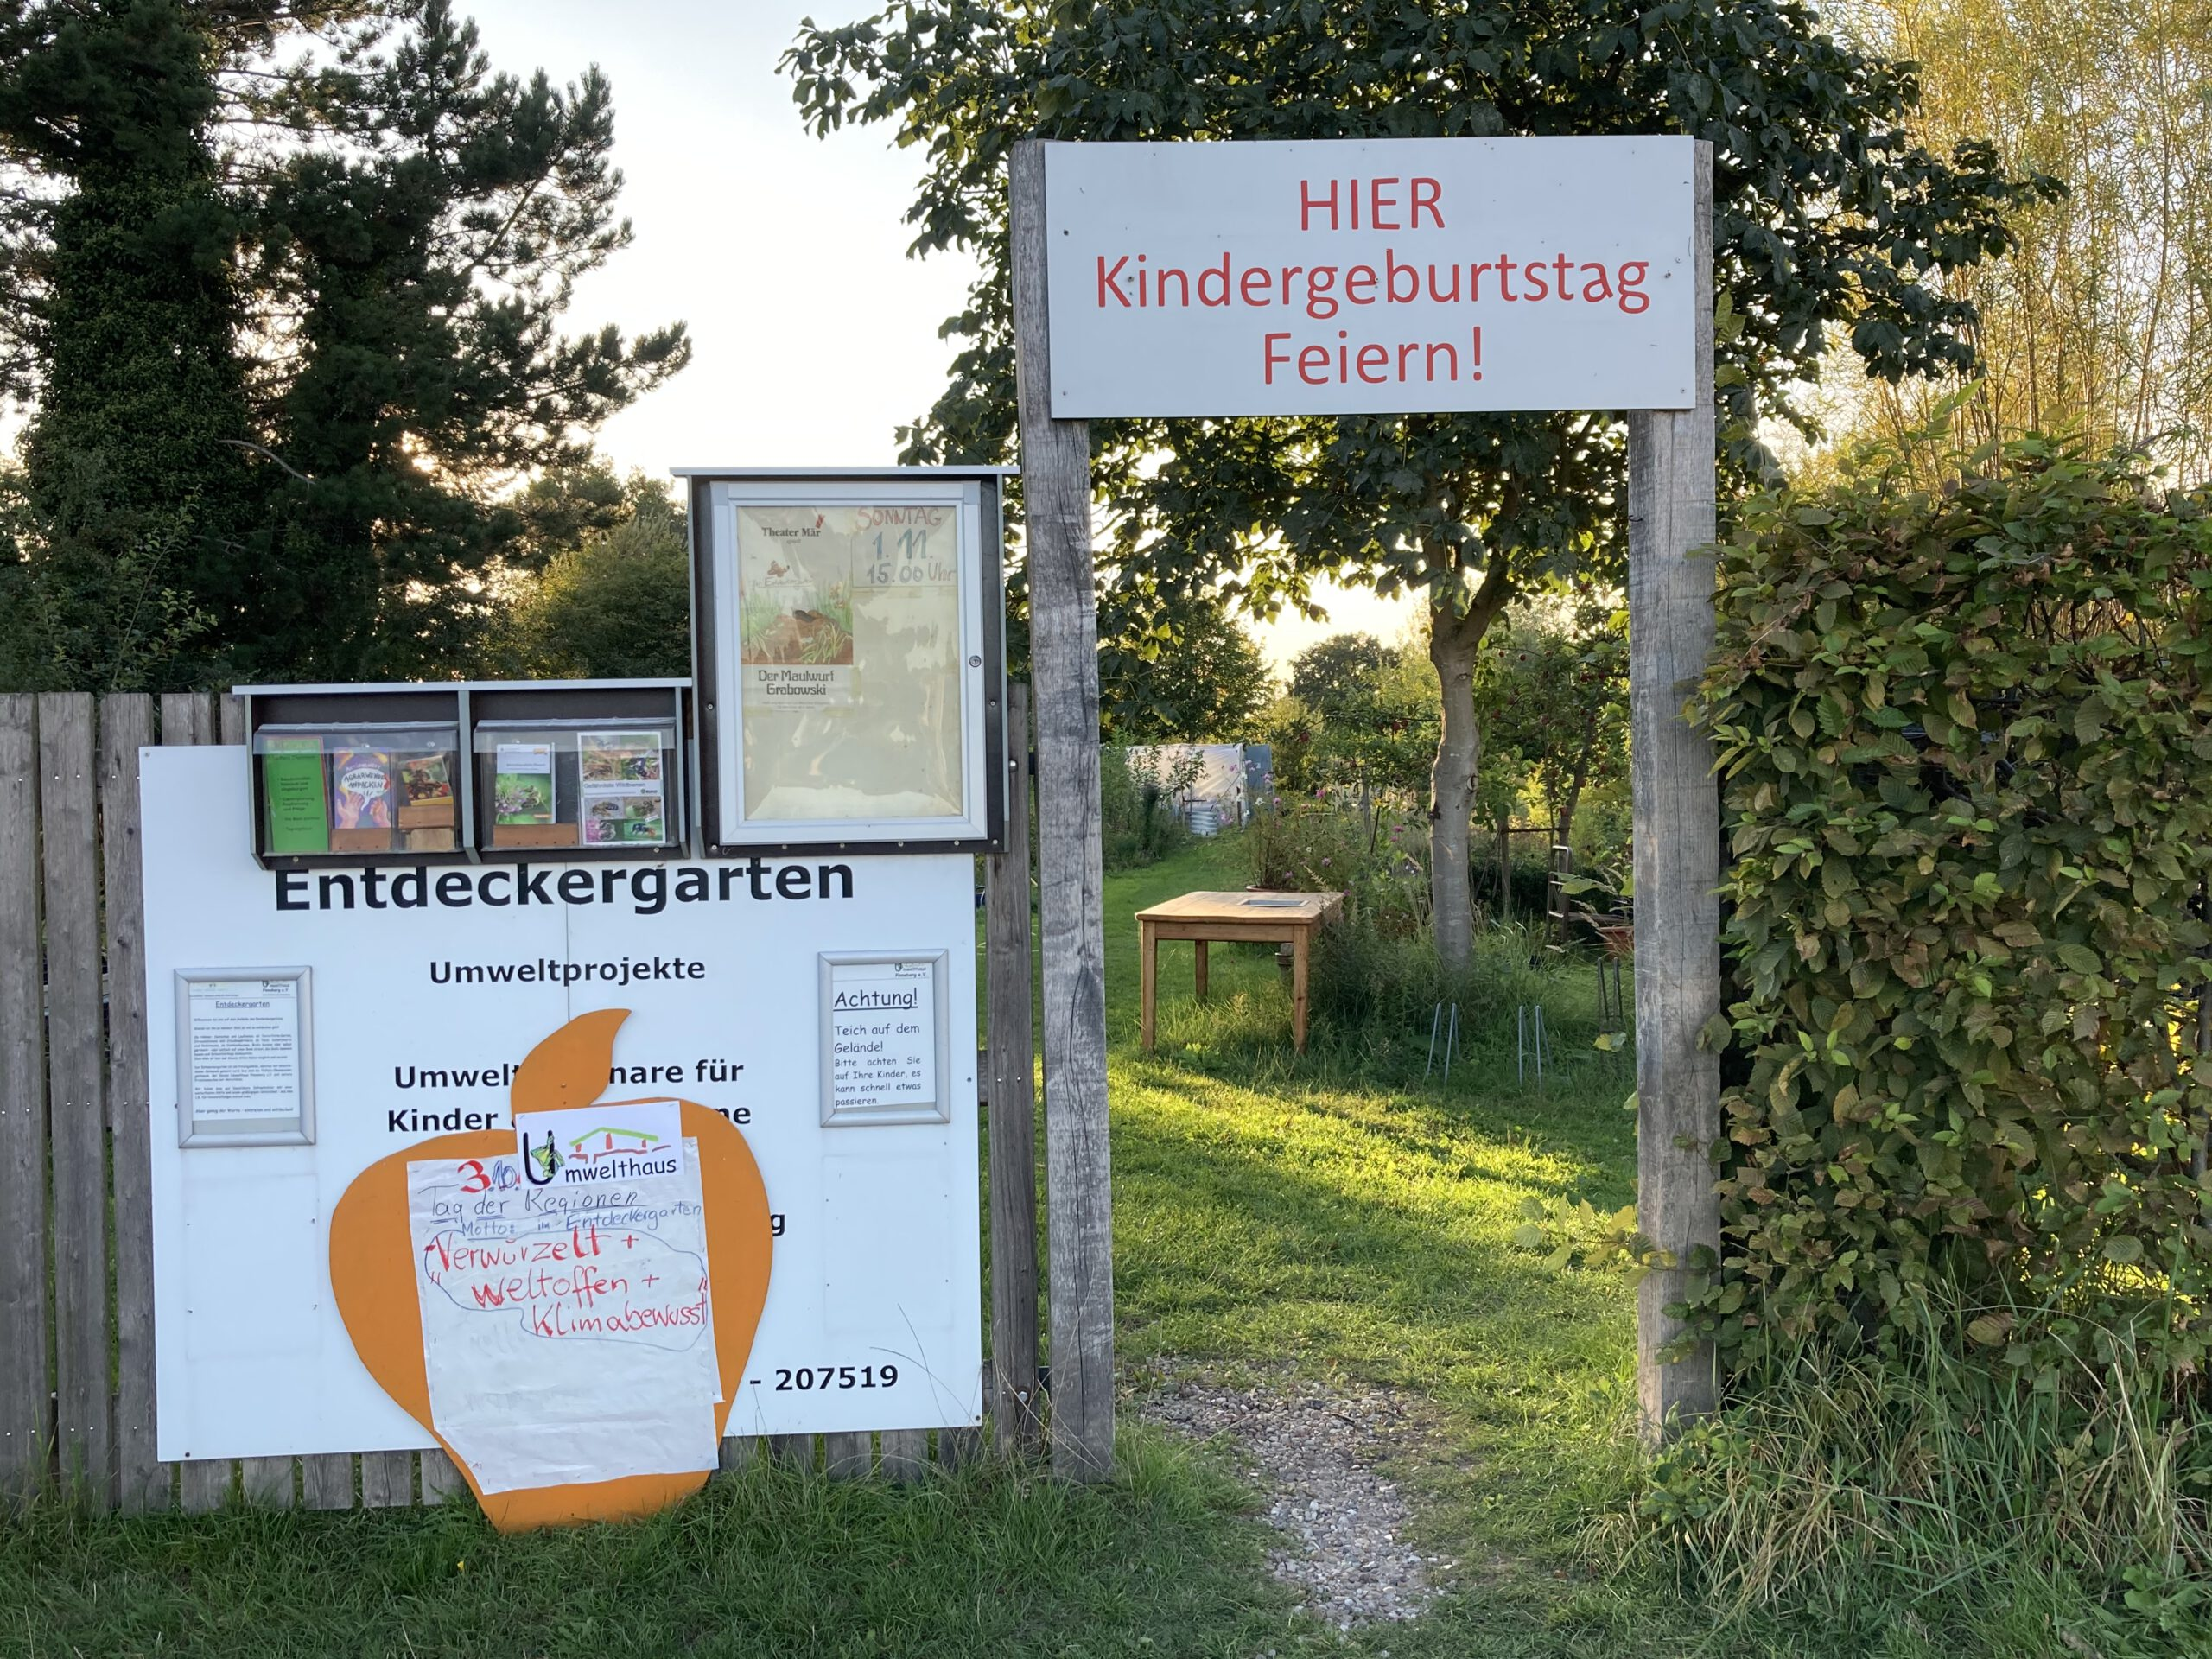 Der Eingang zum Entdeckergarten